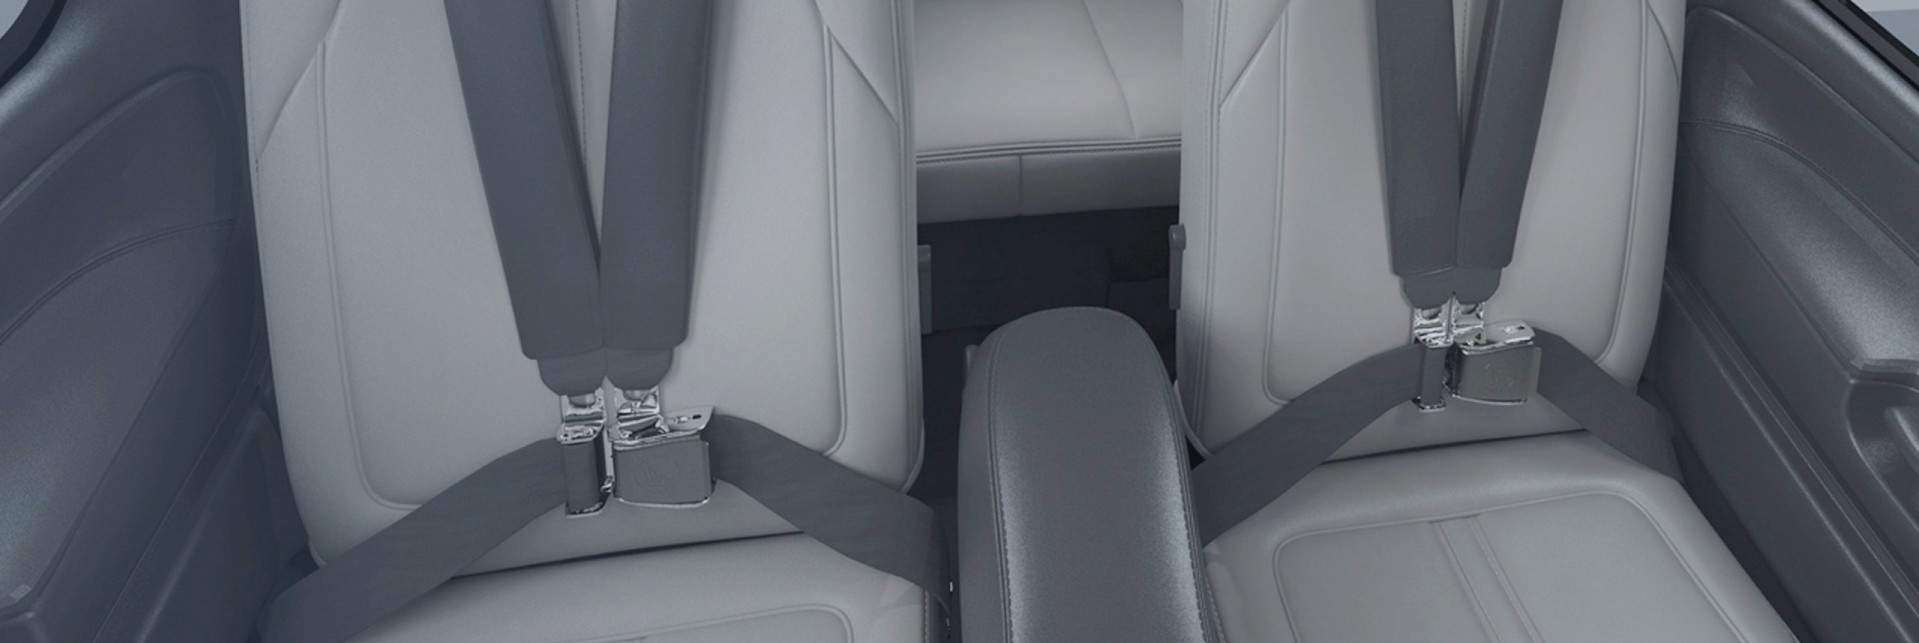 cabin airplane cirrus